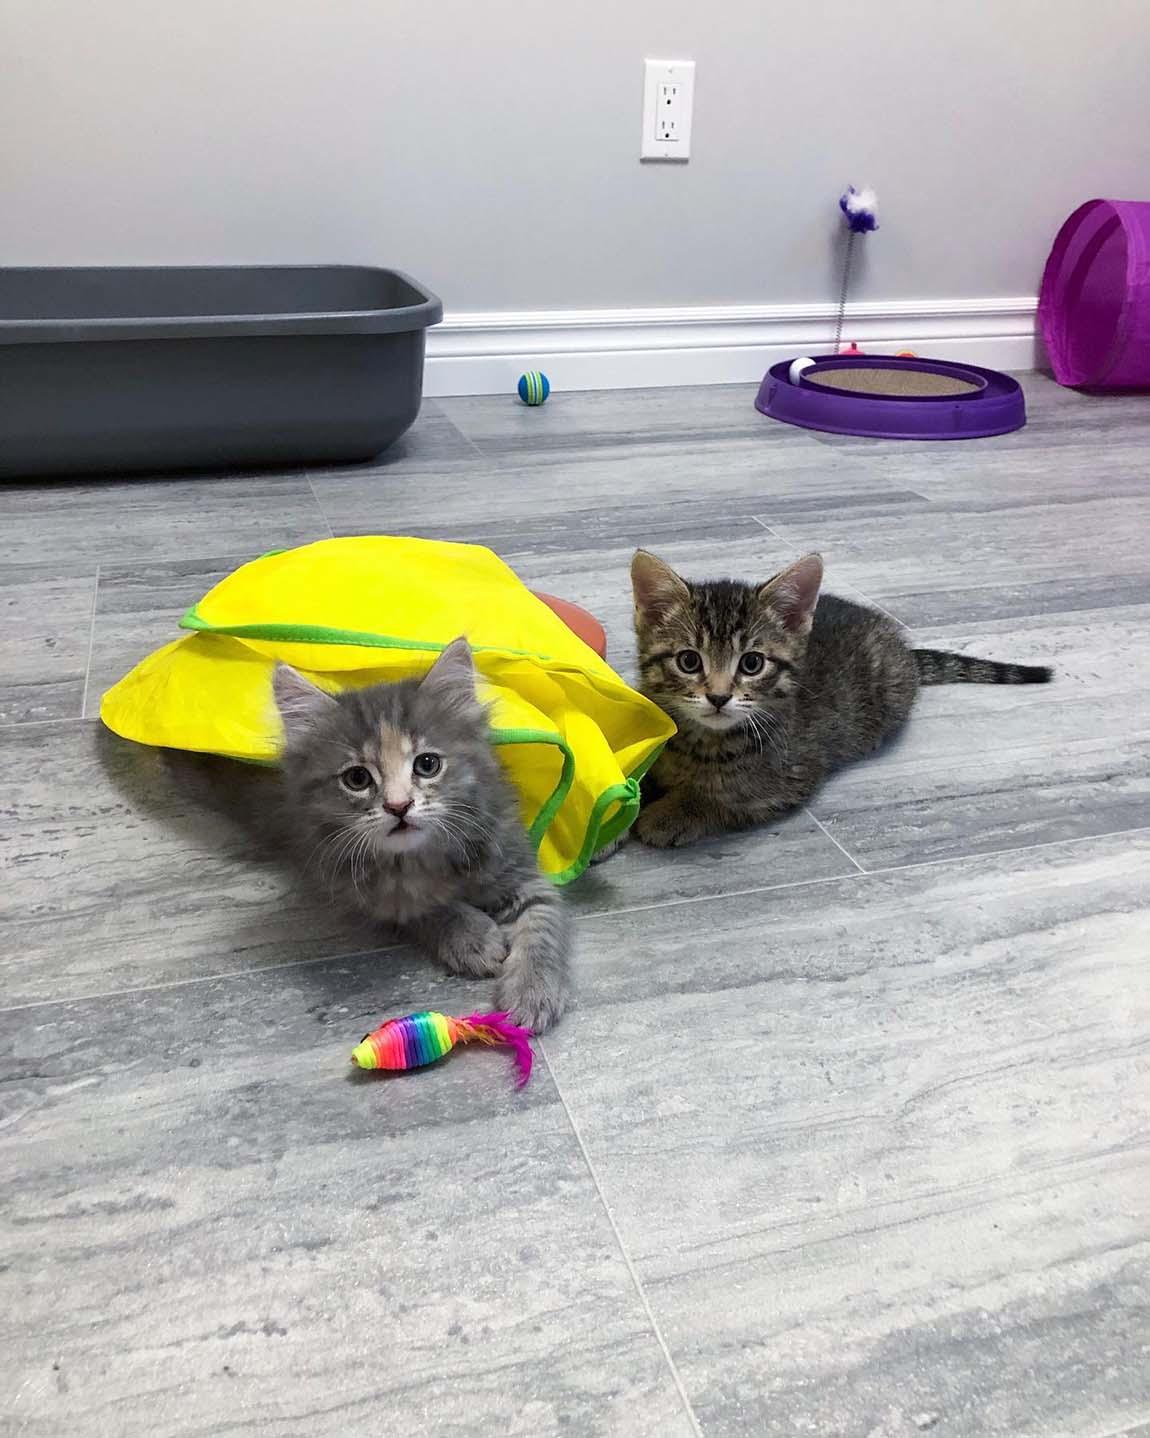 Lindos gatitos bebés